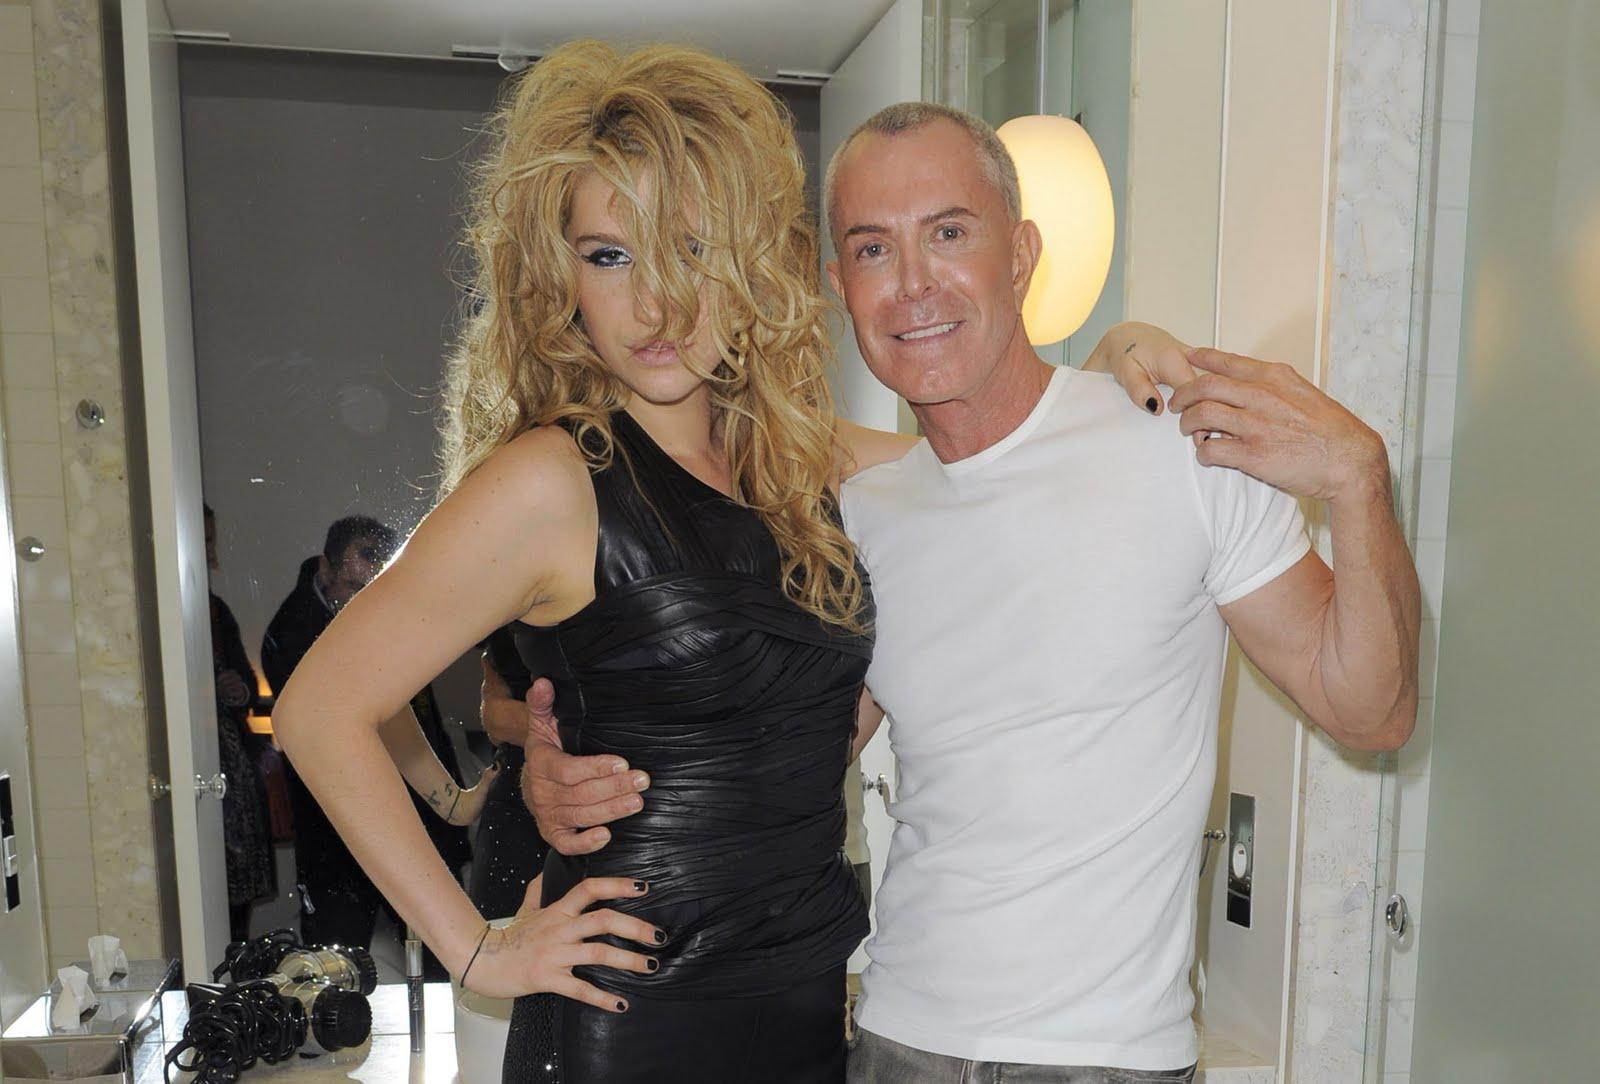 http://2.bp.blogspot.com/_IUzrVt5aNHI/TU0RWJyeGpI/AAAAAAAAEnc/YbC2HcwYxys/s1600/Kesha_Sebert_Personal_Fitting_with_Jean-Claude_Jitrois_in_Paris_January_25_2010_02-743673.jpg